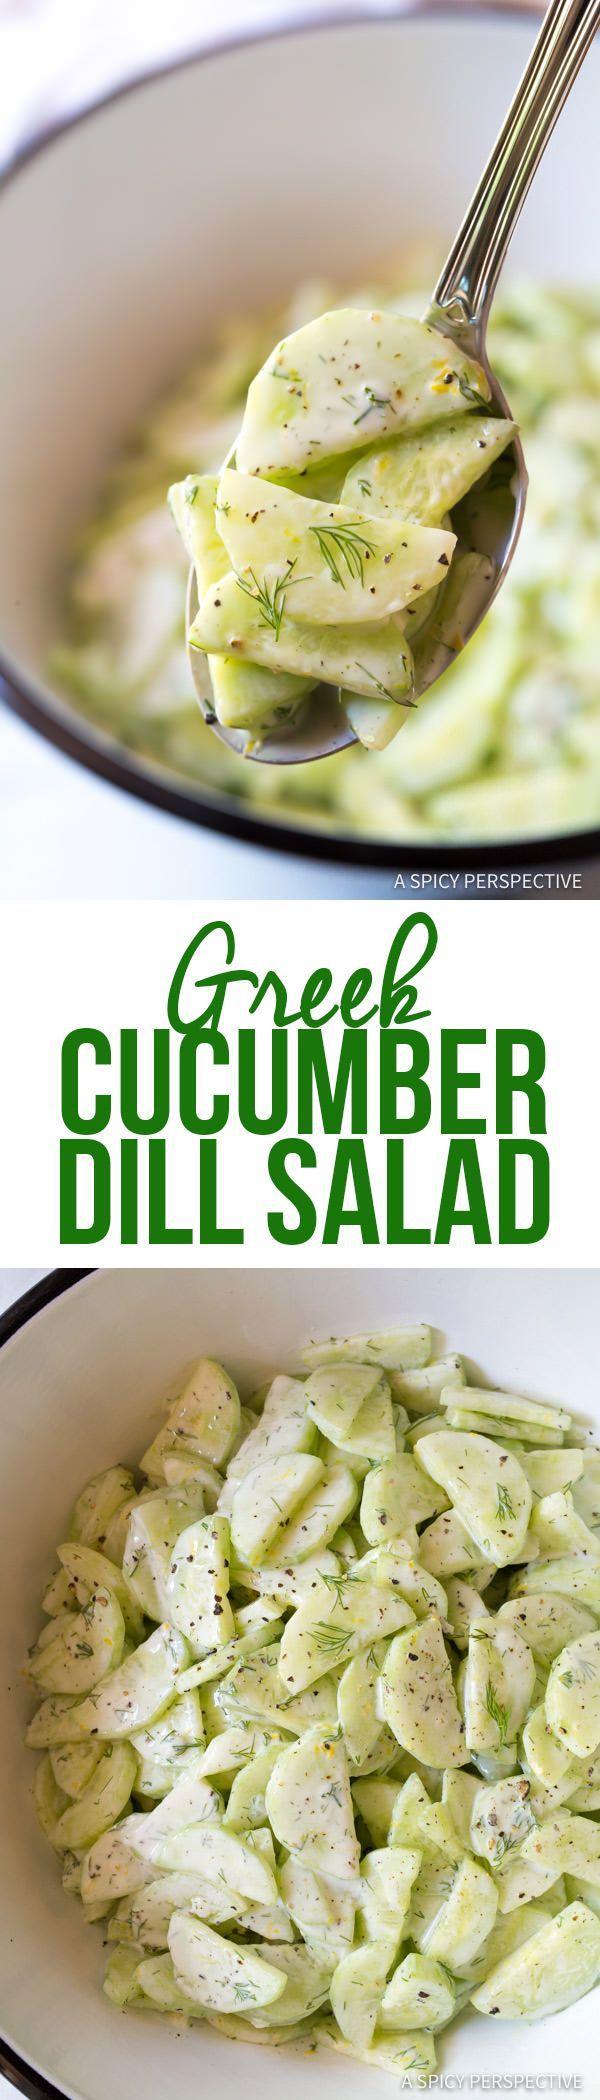 Classic Greek Cucumber Dill Salad Recipe | ASpicyPerspective.com